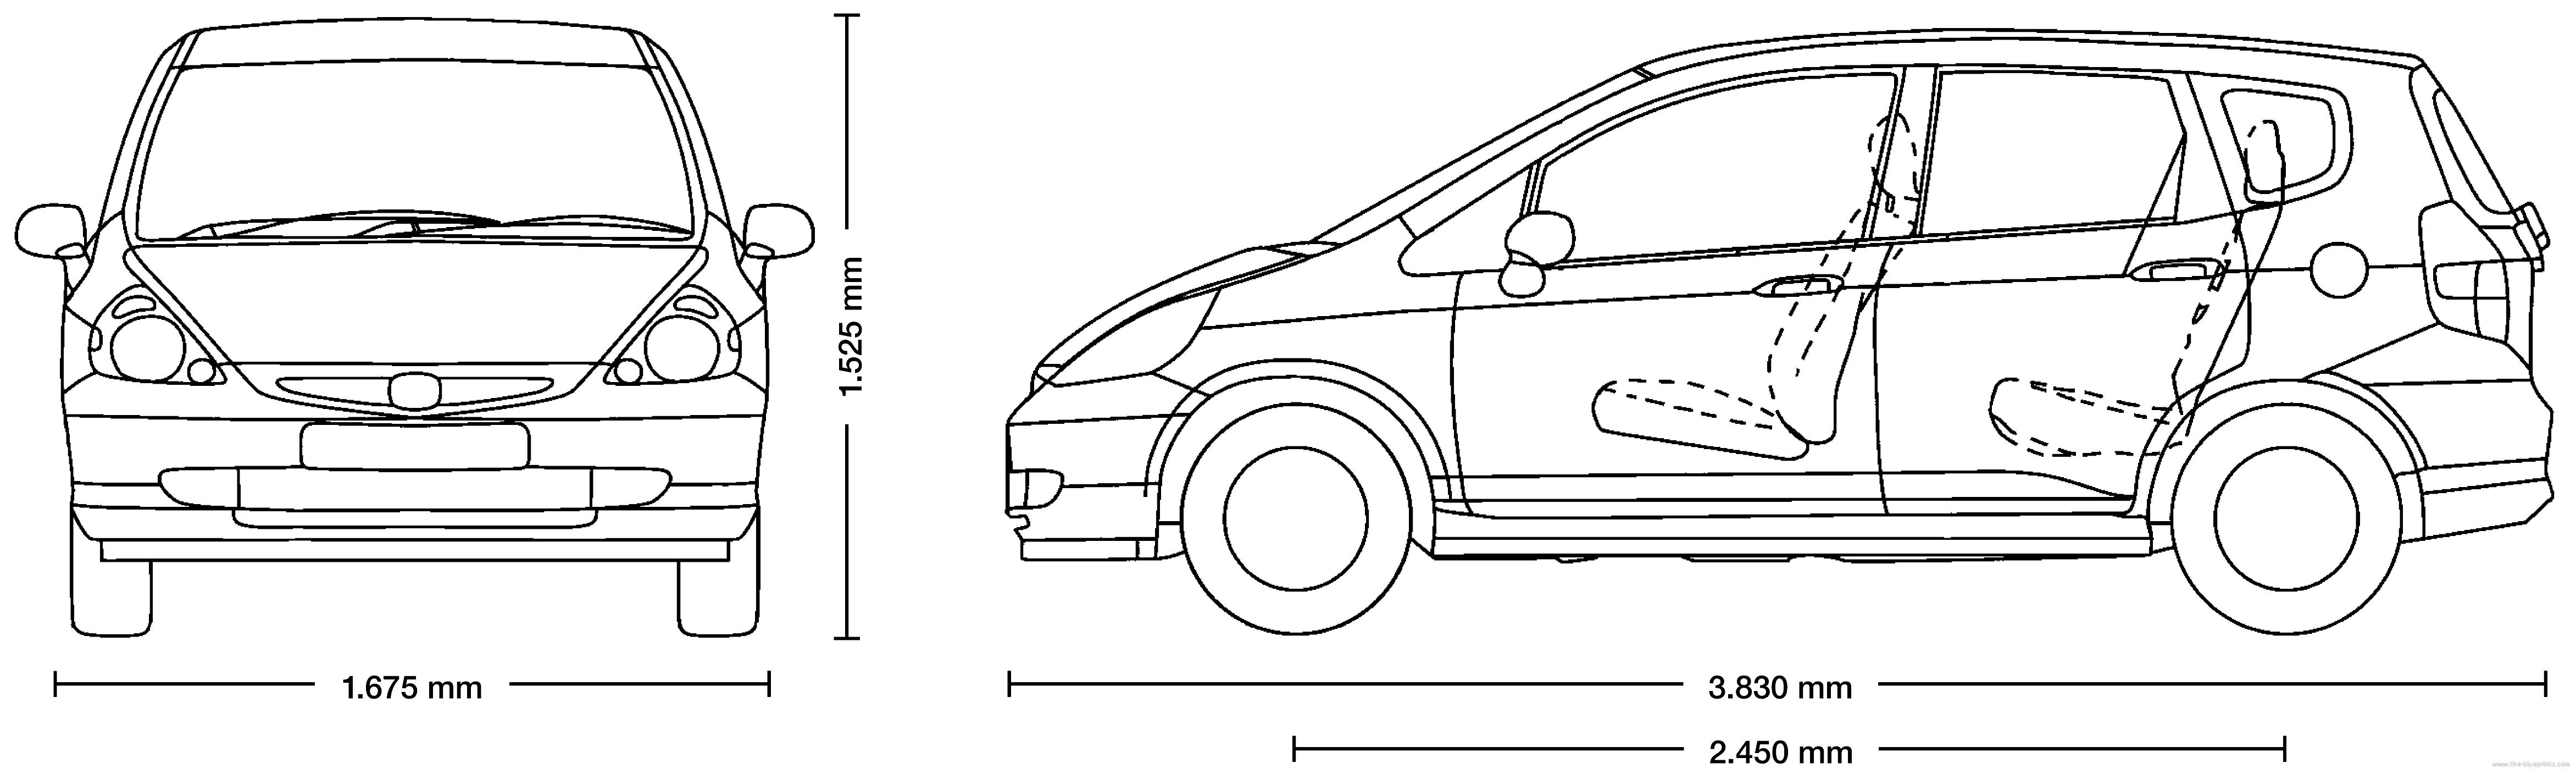 Blueprints Cars Honda Honda Jazz 2004